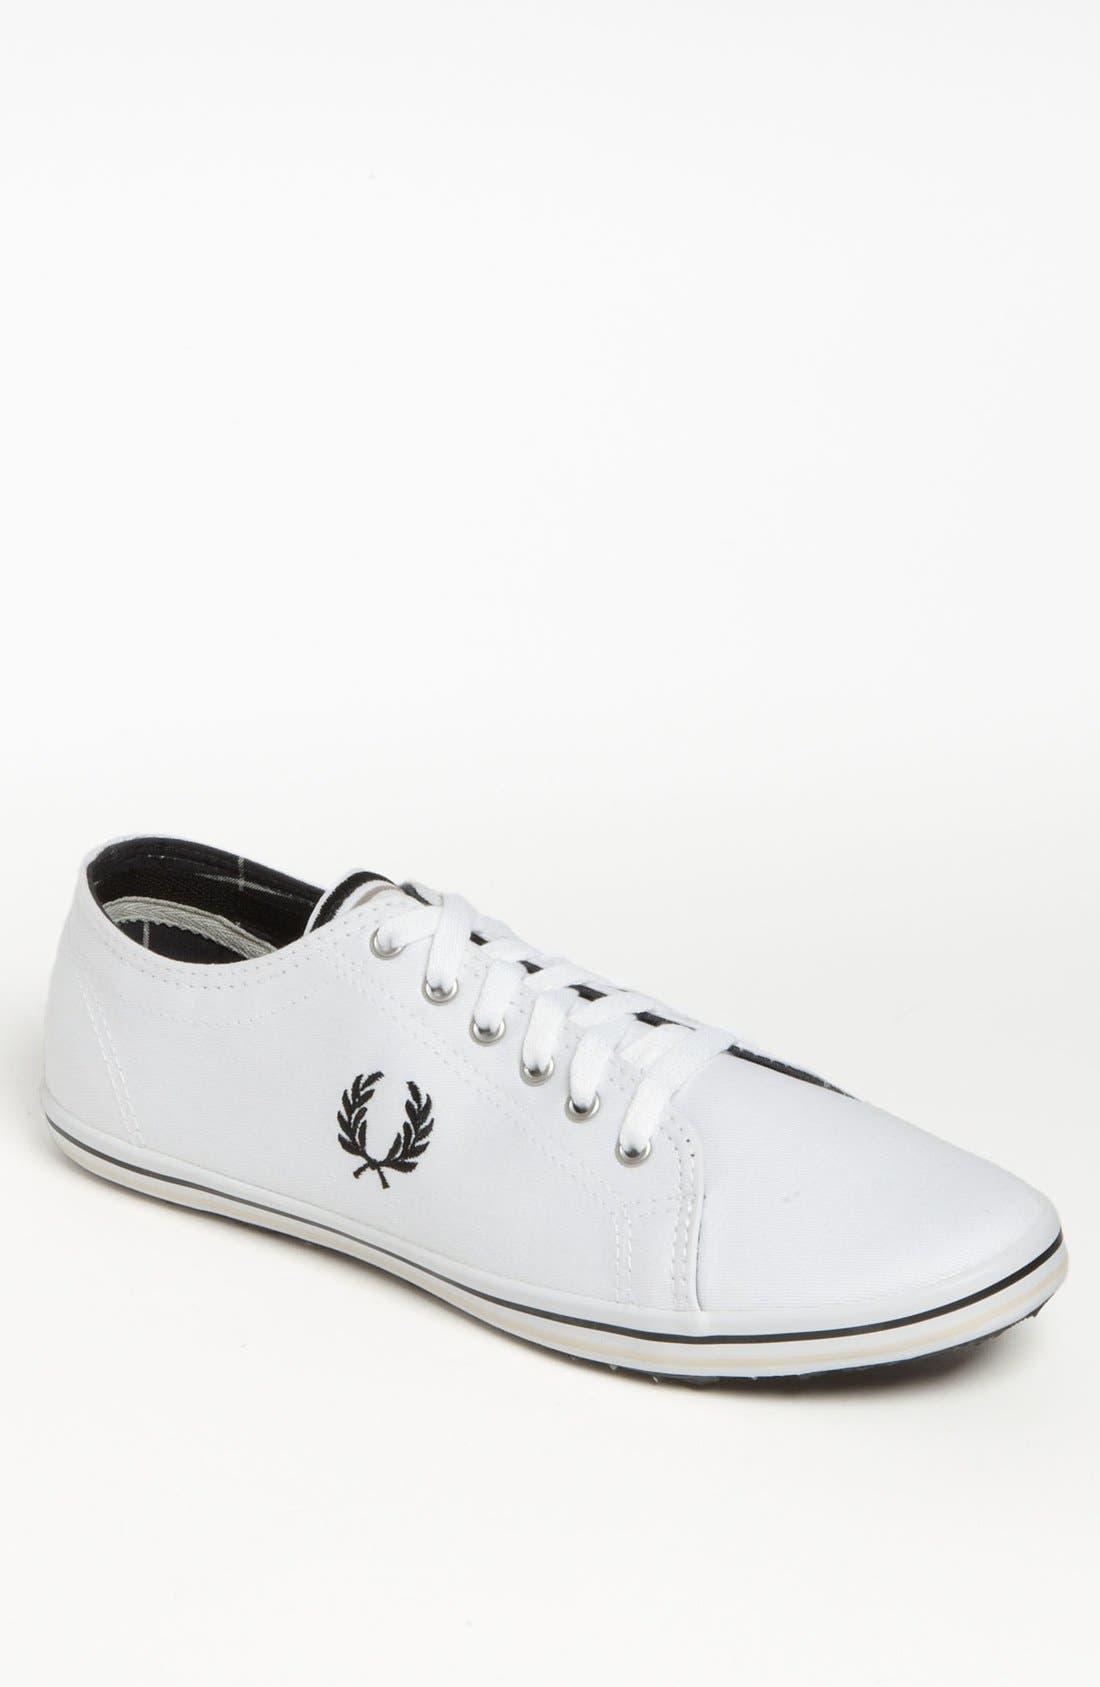 Main Image - Fred Perry 'Kingston' Sneaker (Men)